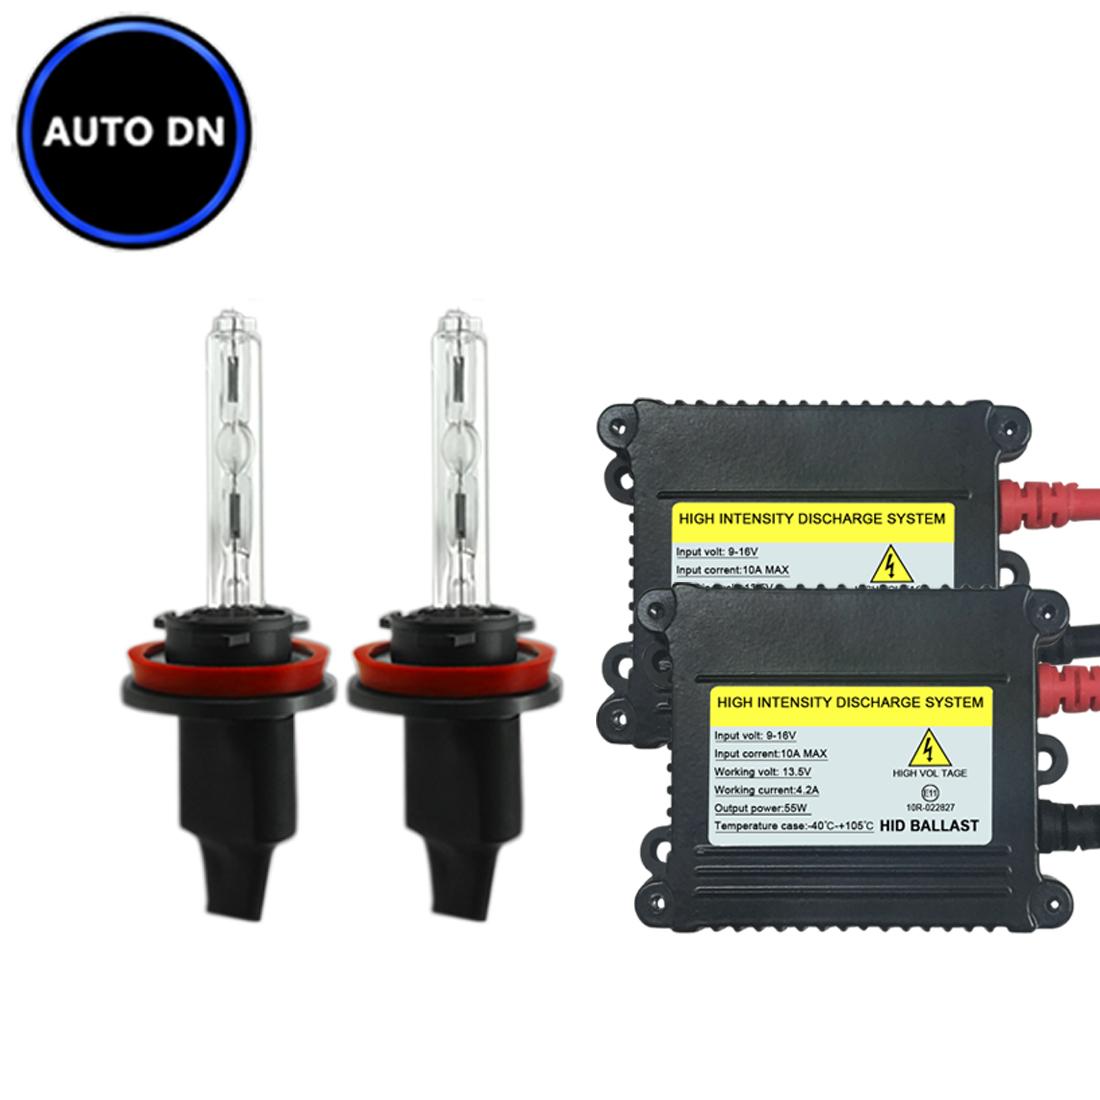 Details about 2x NEW Xenon HID Headlight Bulbs 9006 5K 6K 8K 10K DBK Low  Beam Conversion Kit